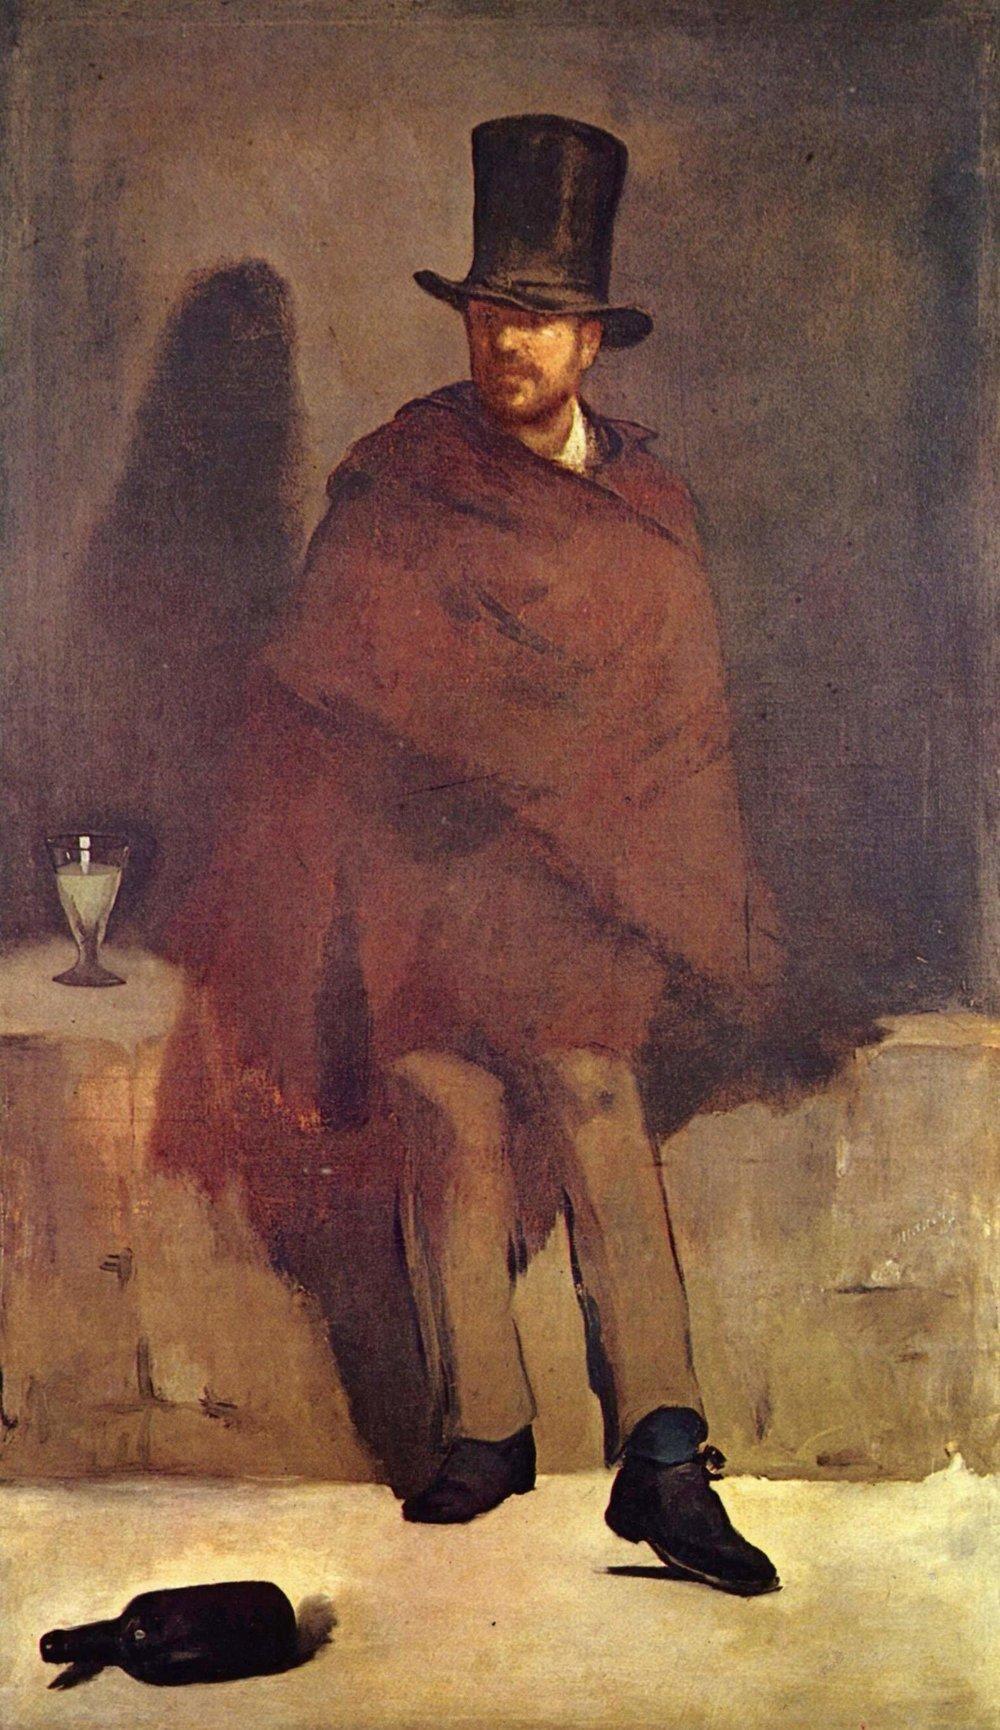 Edouard Manet, Absinthe Drinker  (1859)